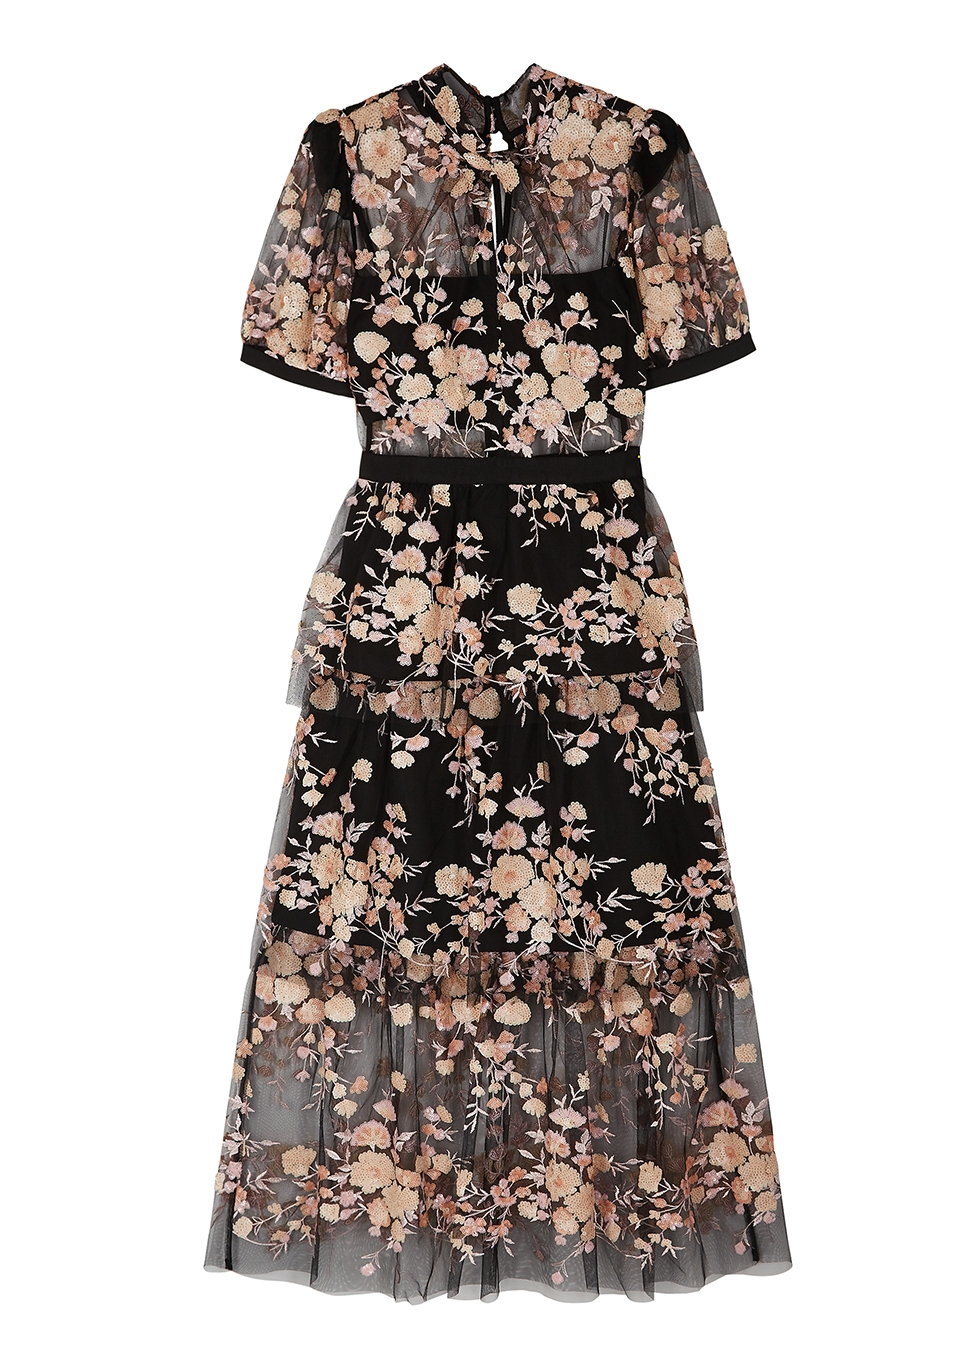 5b53fea16251 Designer Dresses & Designer Gowns - Harvey Nichols